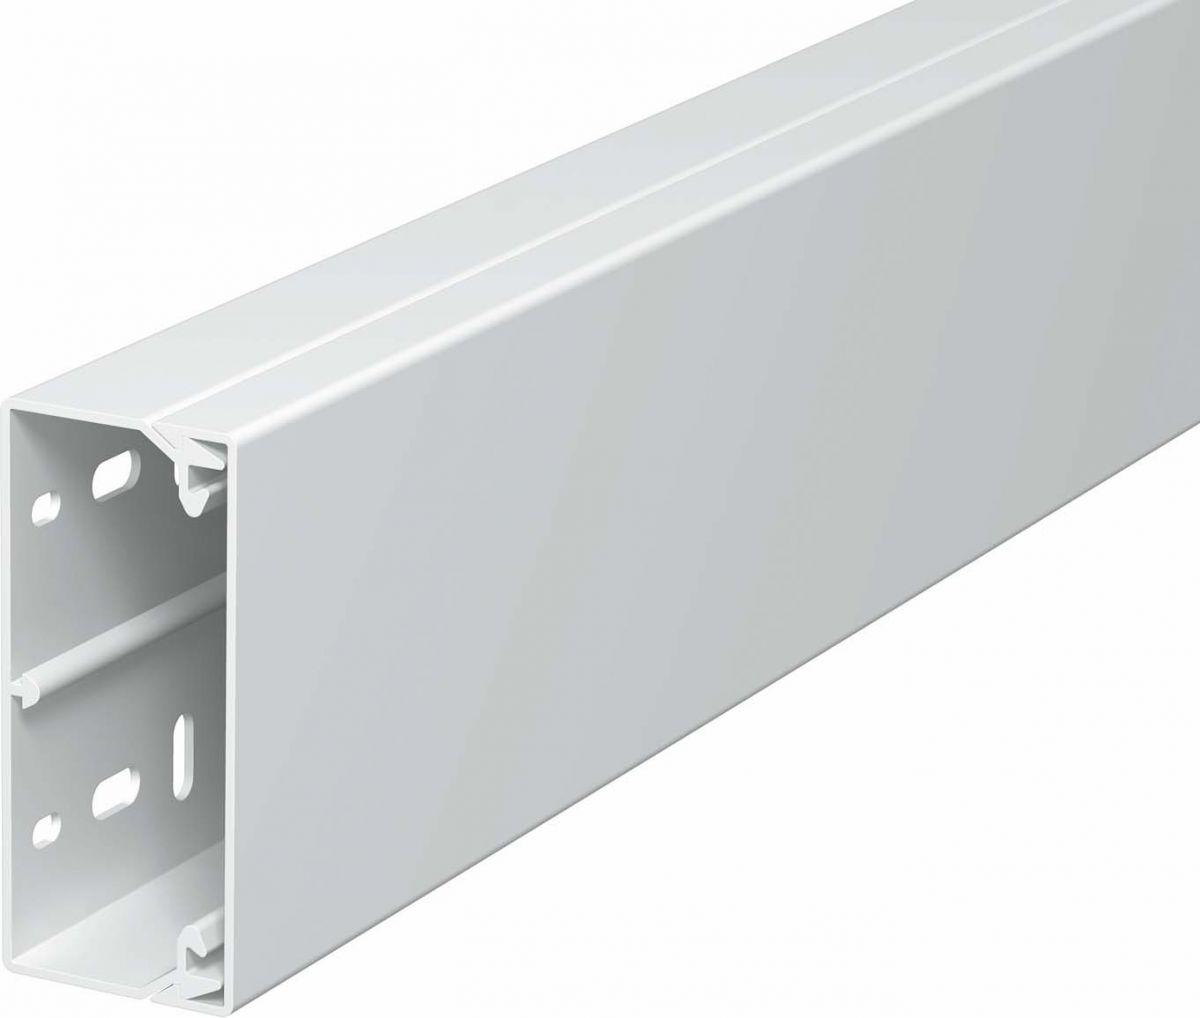 OBO BETTERMANN Kabelkanal WDK40090 reinweiß